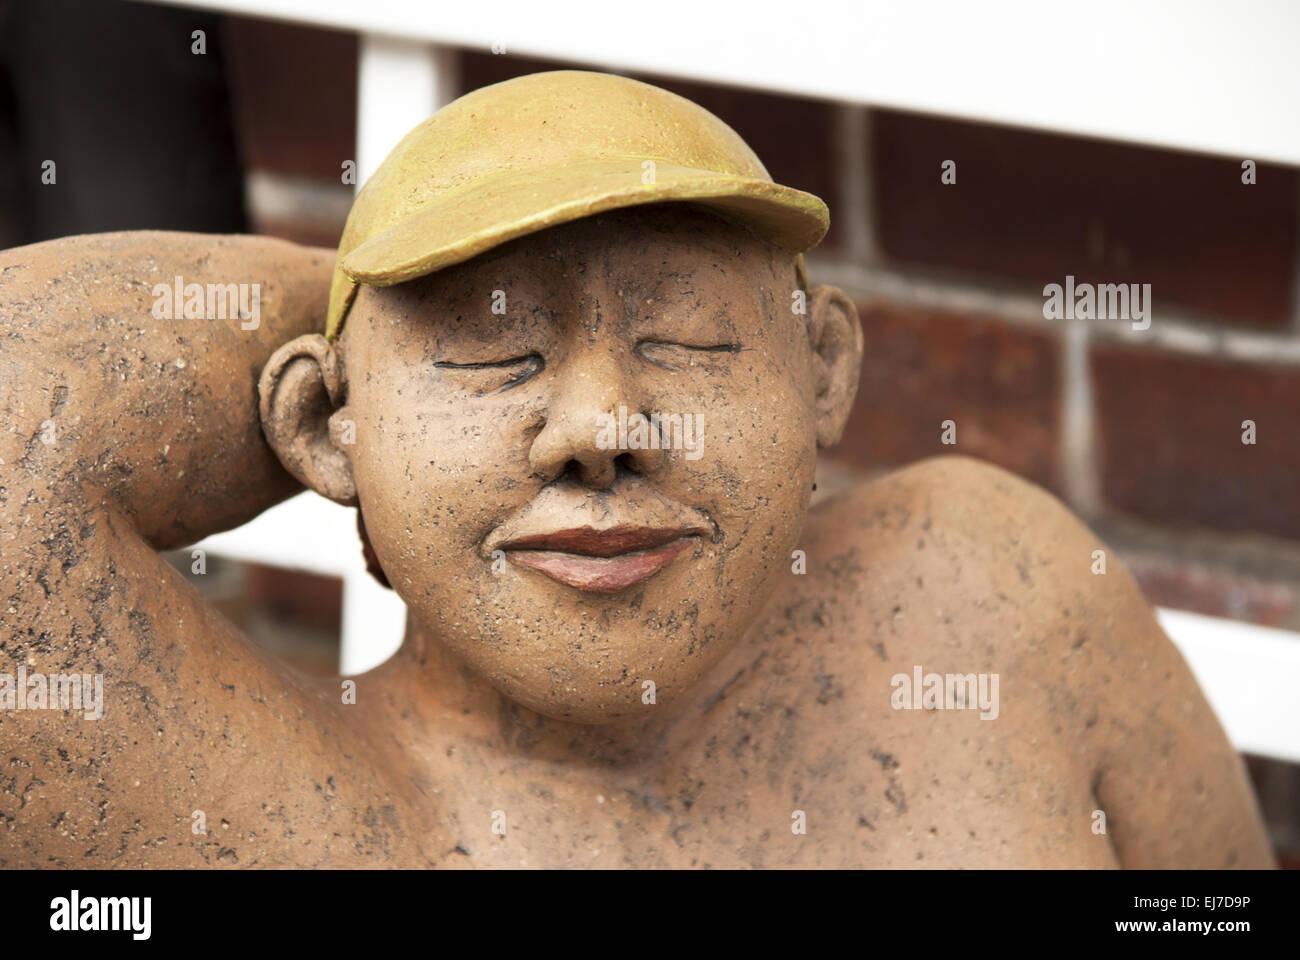 Sunbather - Stock Image